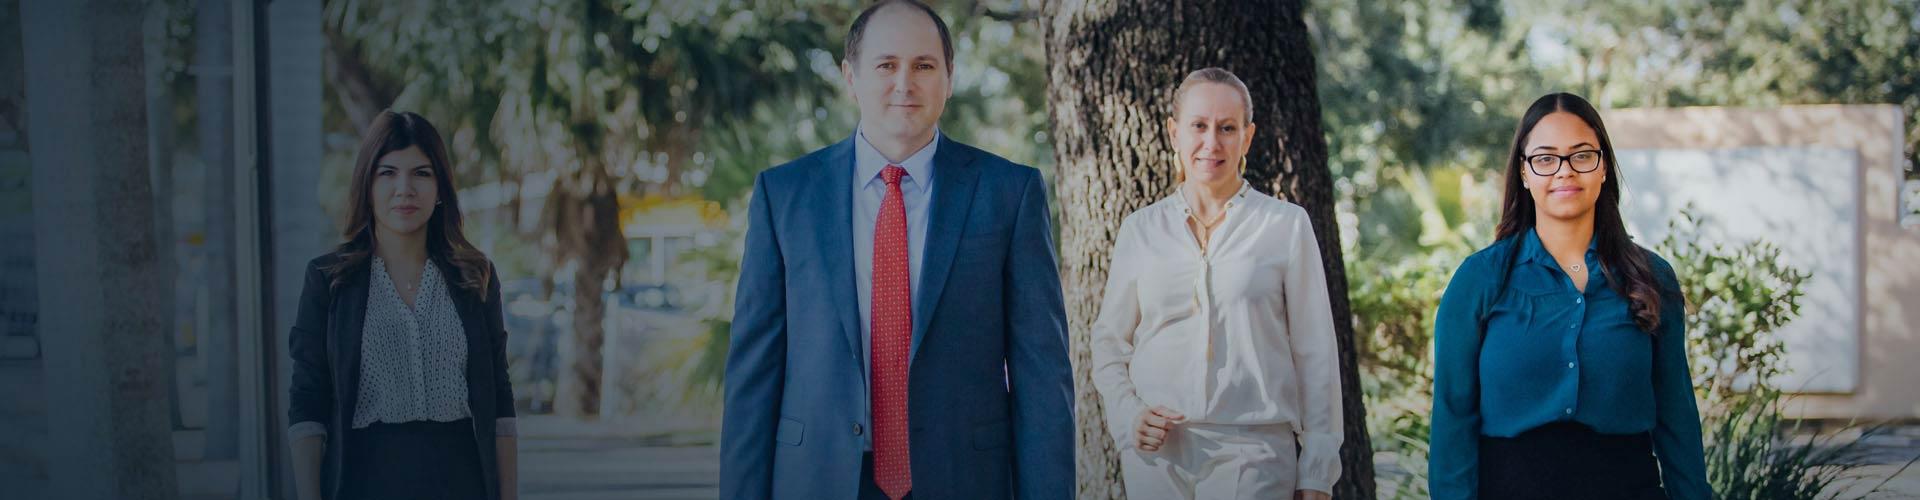 Pompano Beach Chapter 7 Attorneys Near Me - Stiberman Law Firm